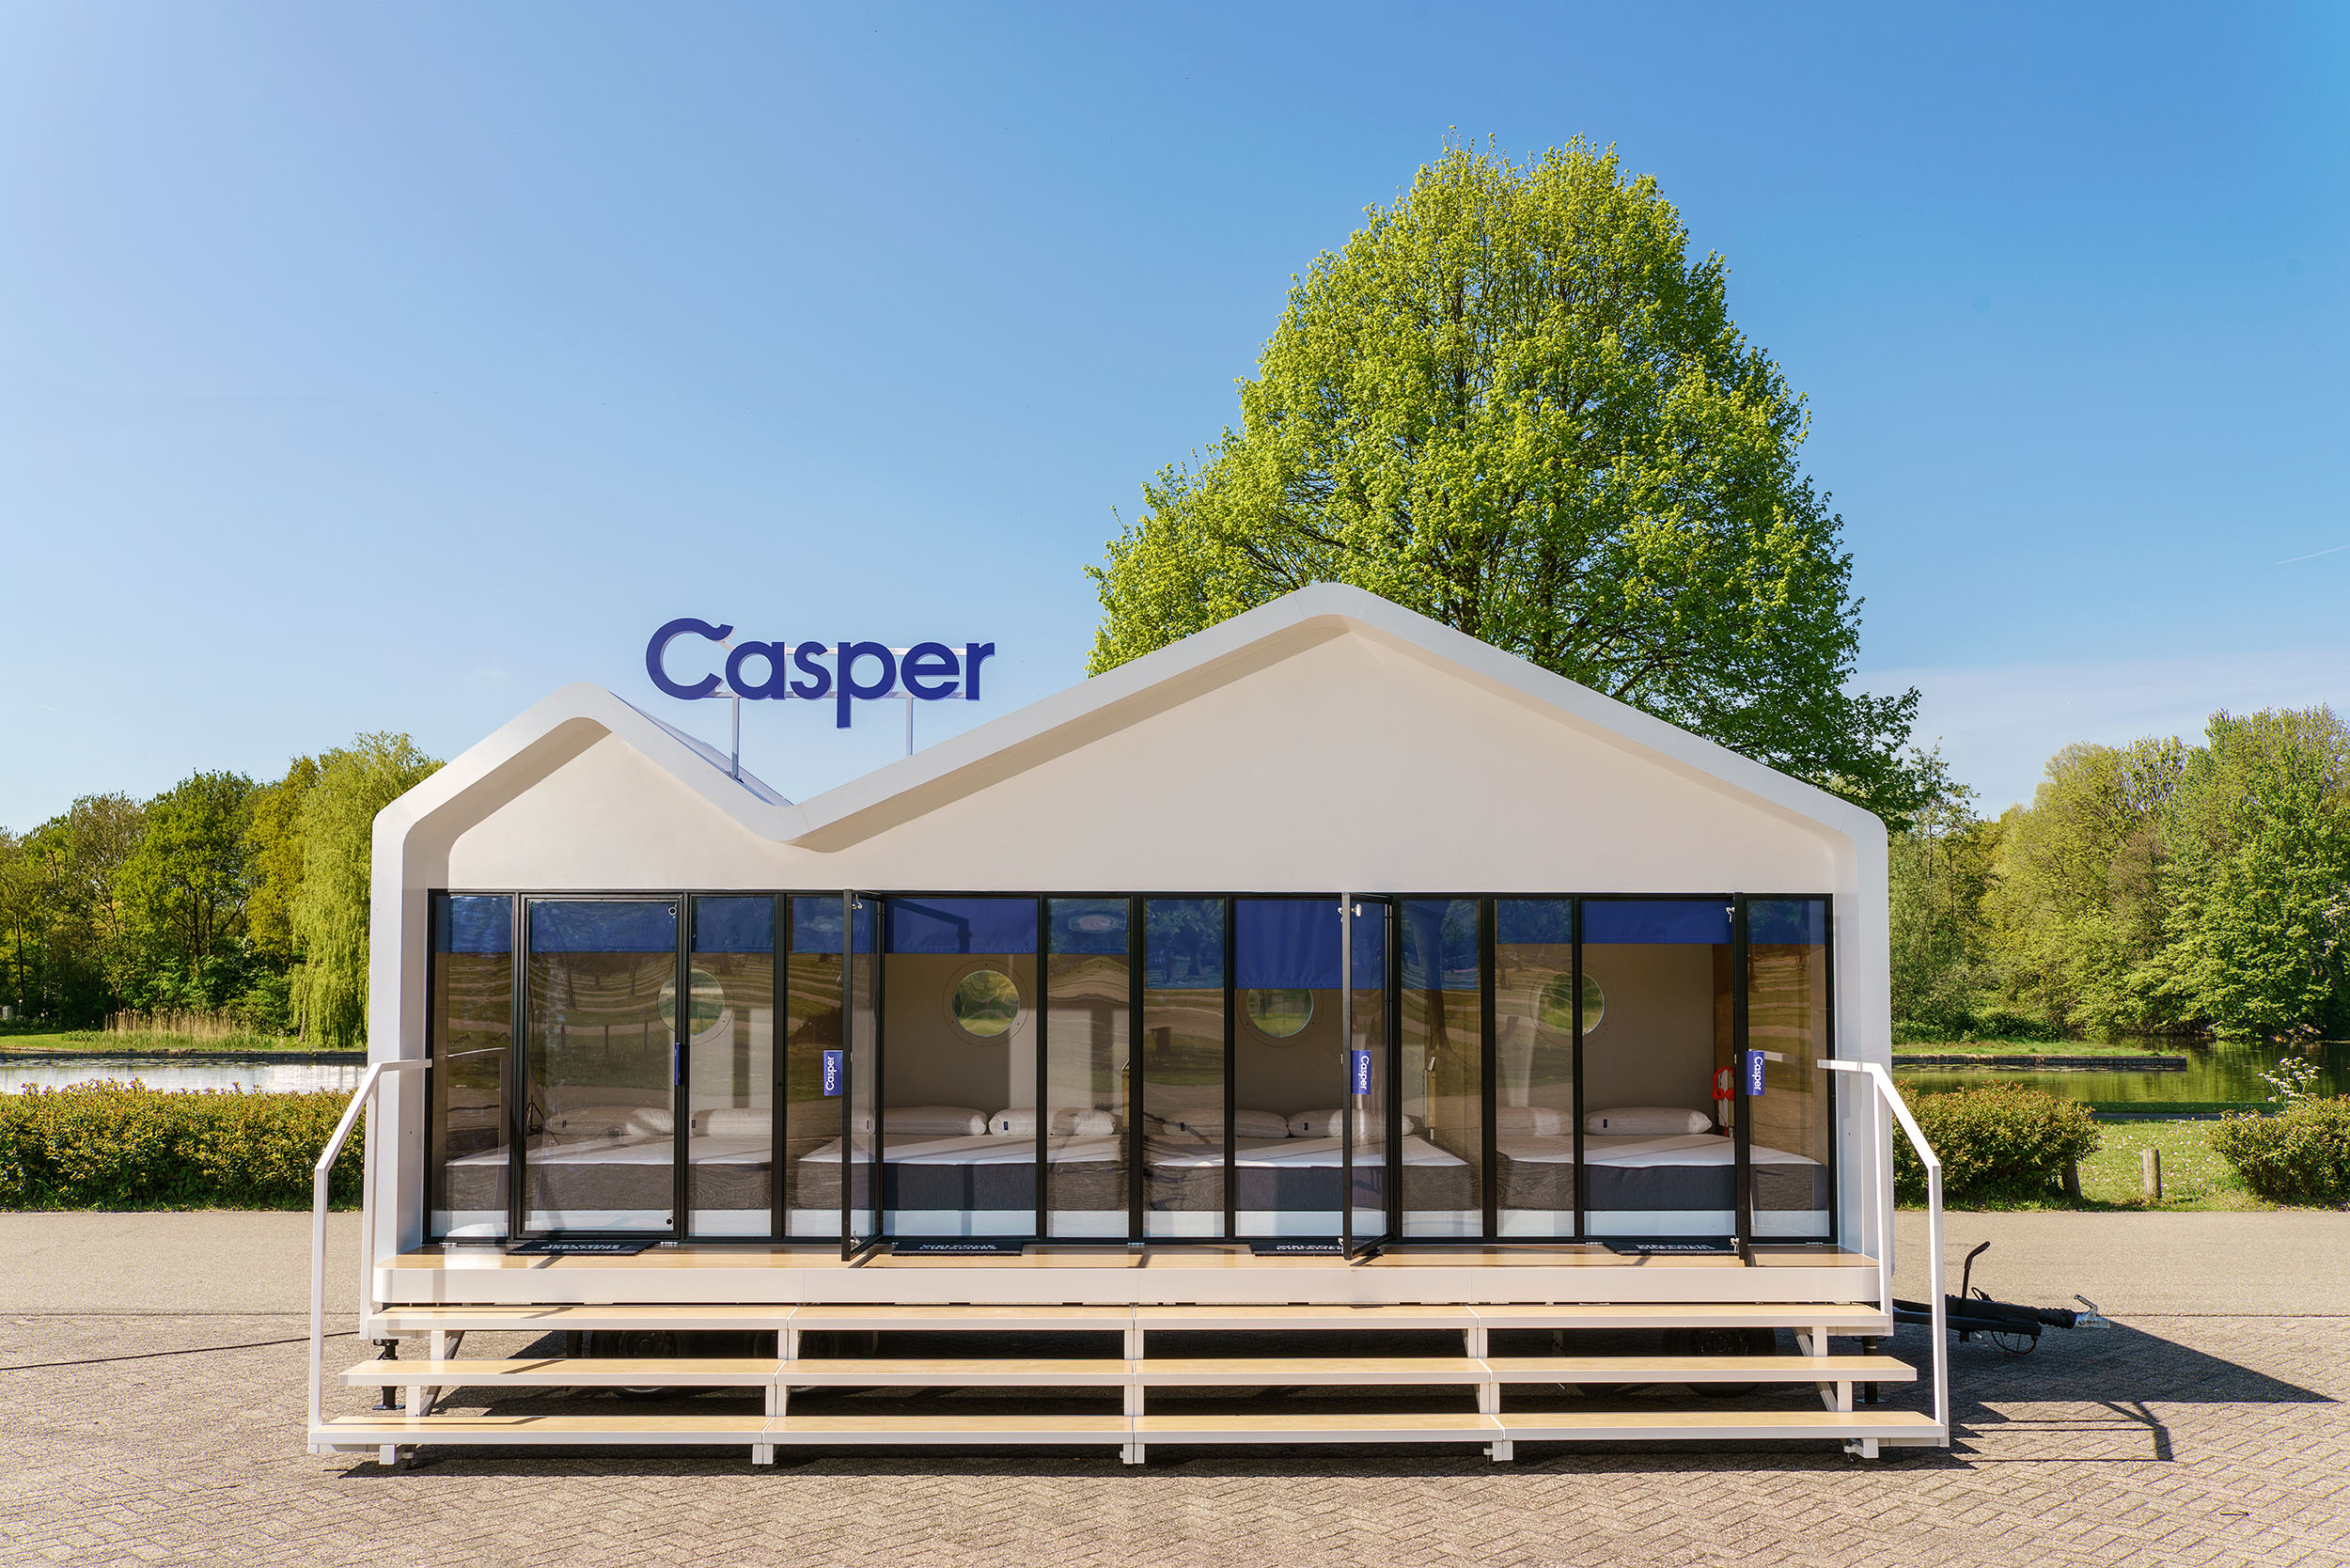 20170510 Casper-Wink by_M_Immink 047